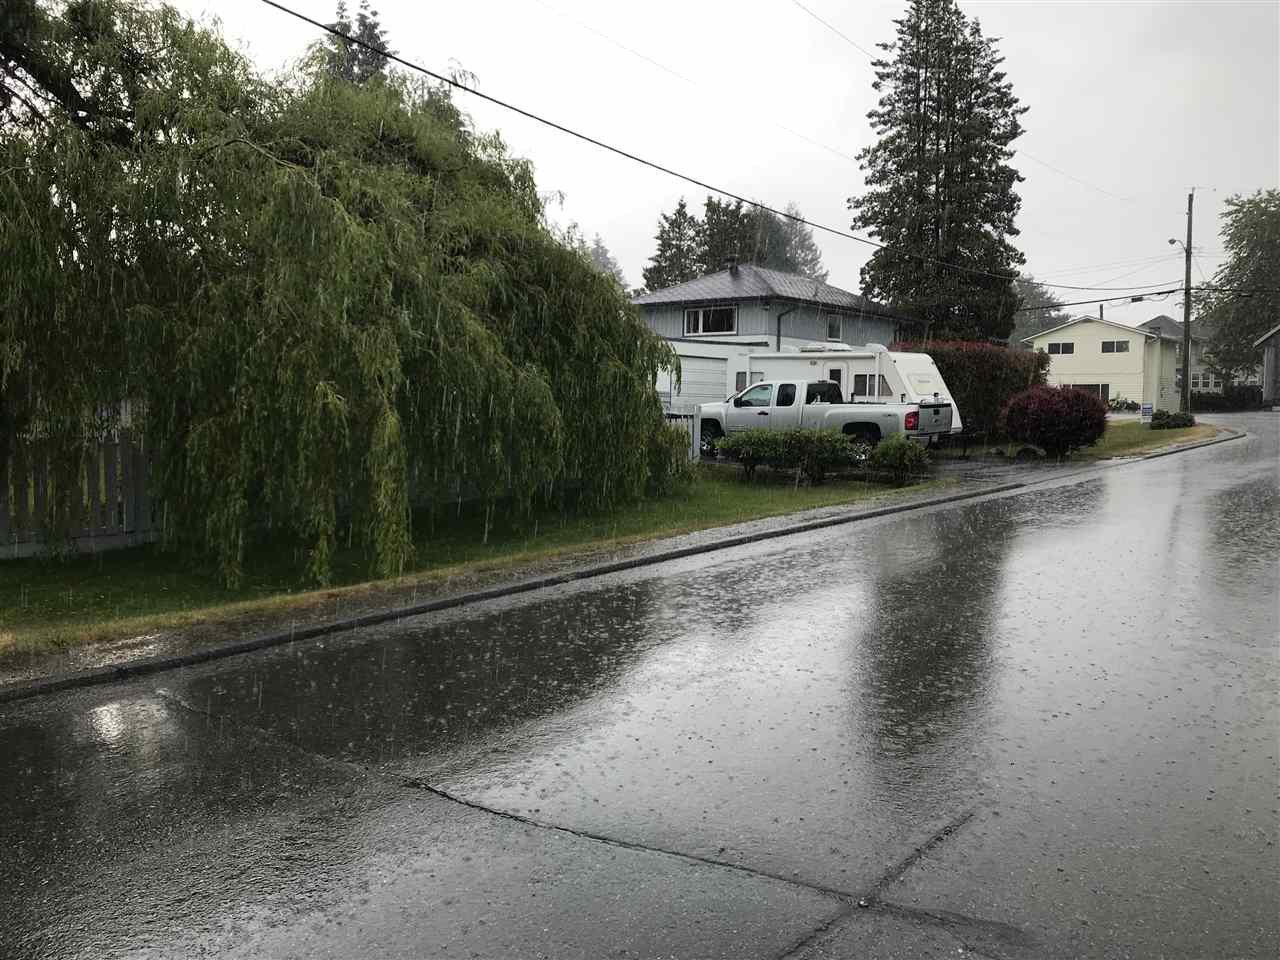 Photo 3: Photos: 9757 123 Street in Surrey: Cedar Hills House for sale (North Surrey)  : MLS®# R2279897